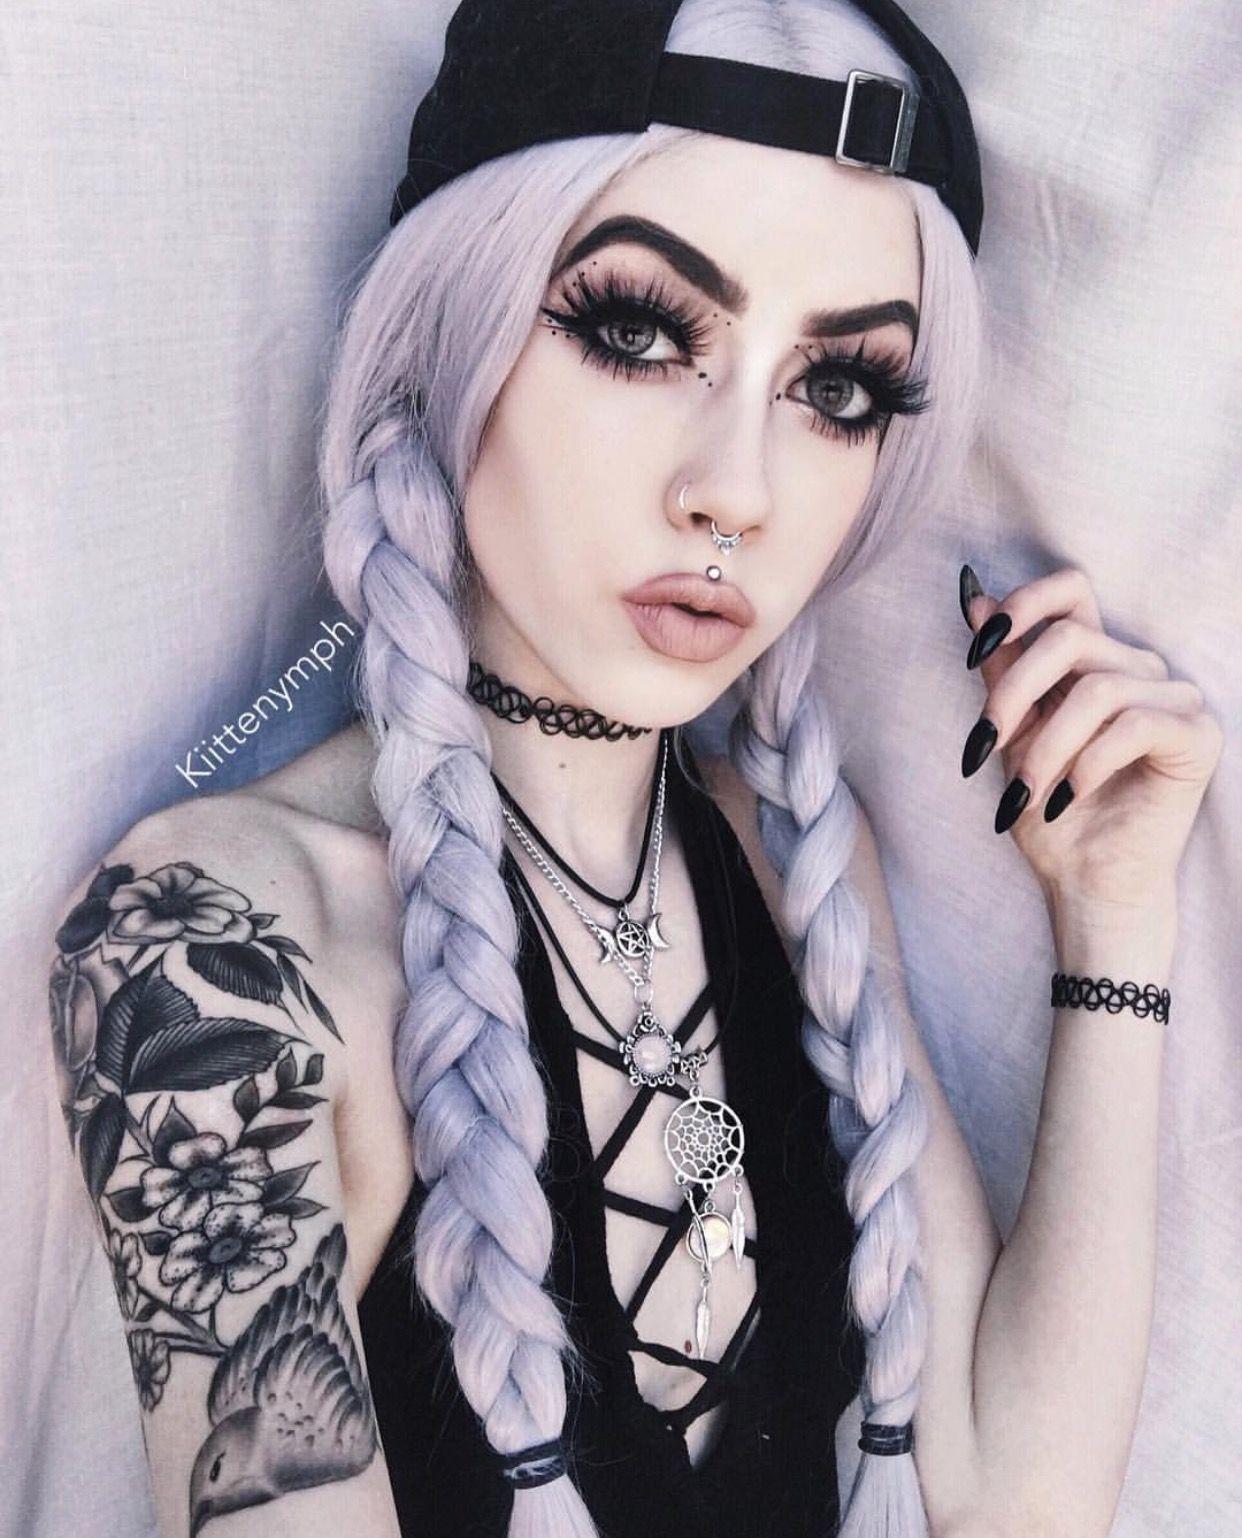 Pin by 𝓣𝓲𝓪 𝓶𝓪𝓻𝓲𝓪 on black fetish pinterest